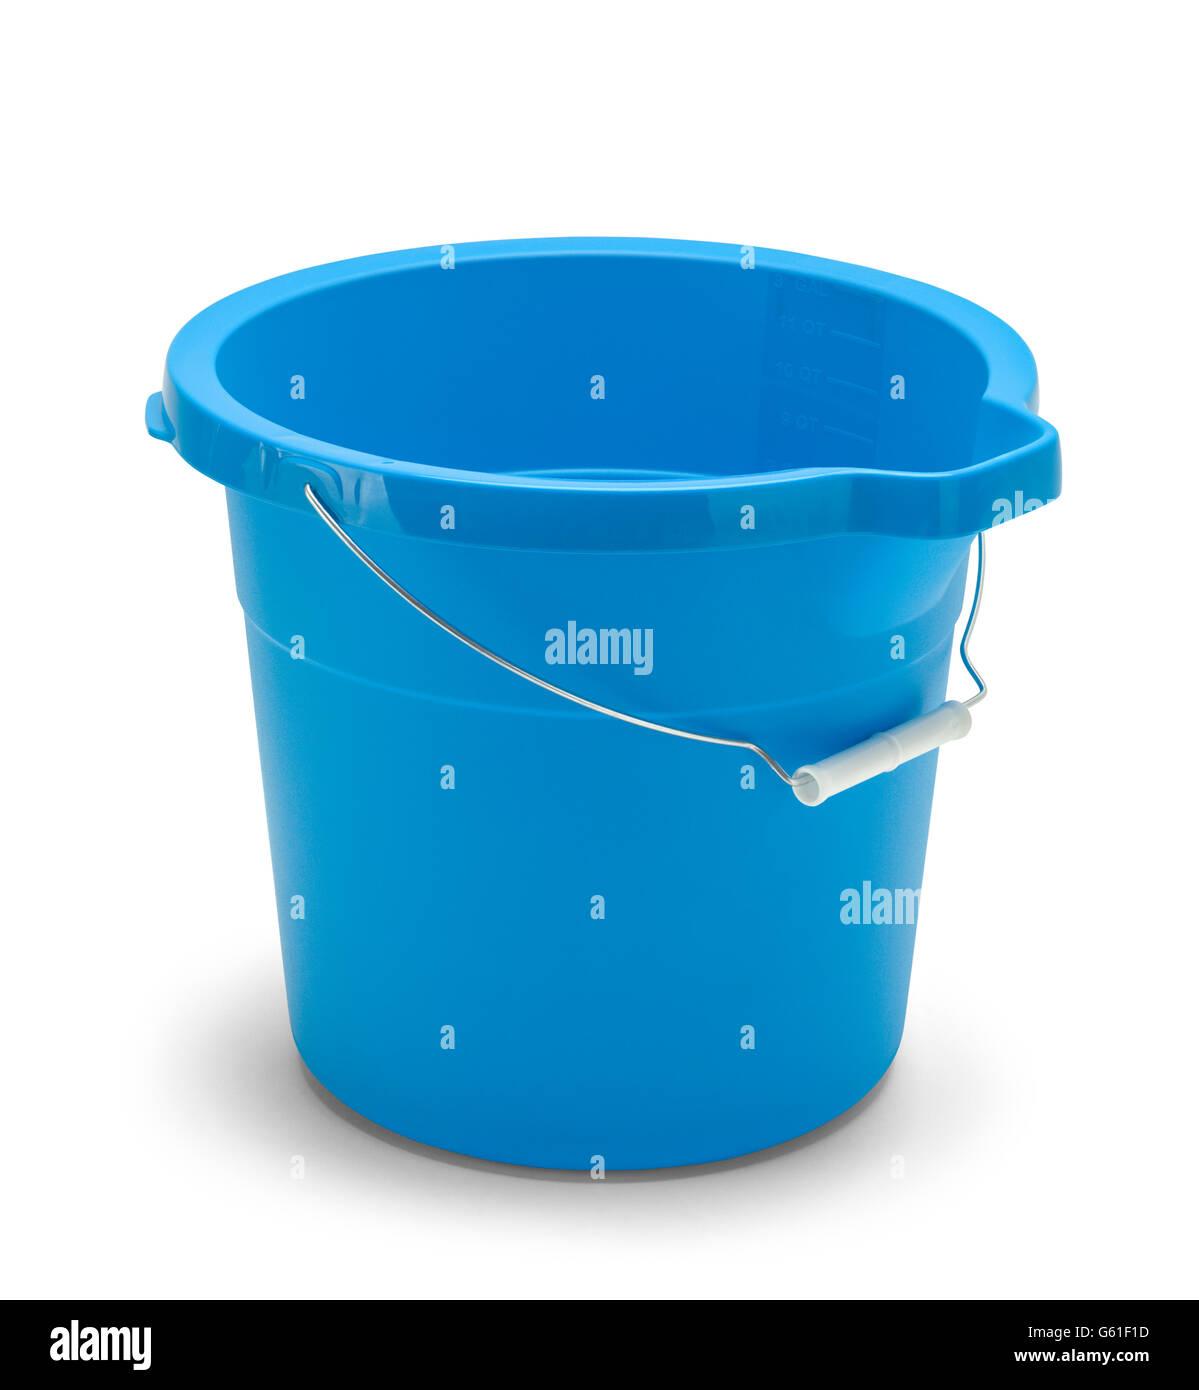 Empty Blue Cleaning Bucket Isolated on White Background. - Stock Image